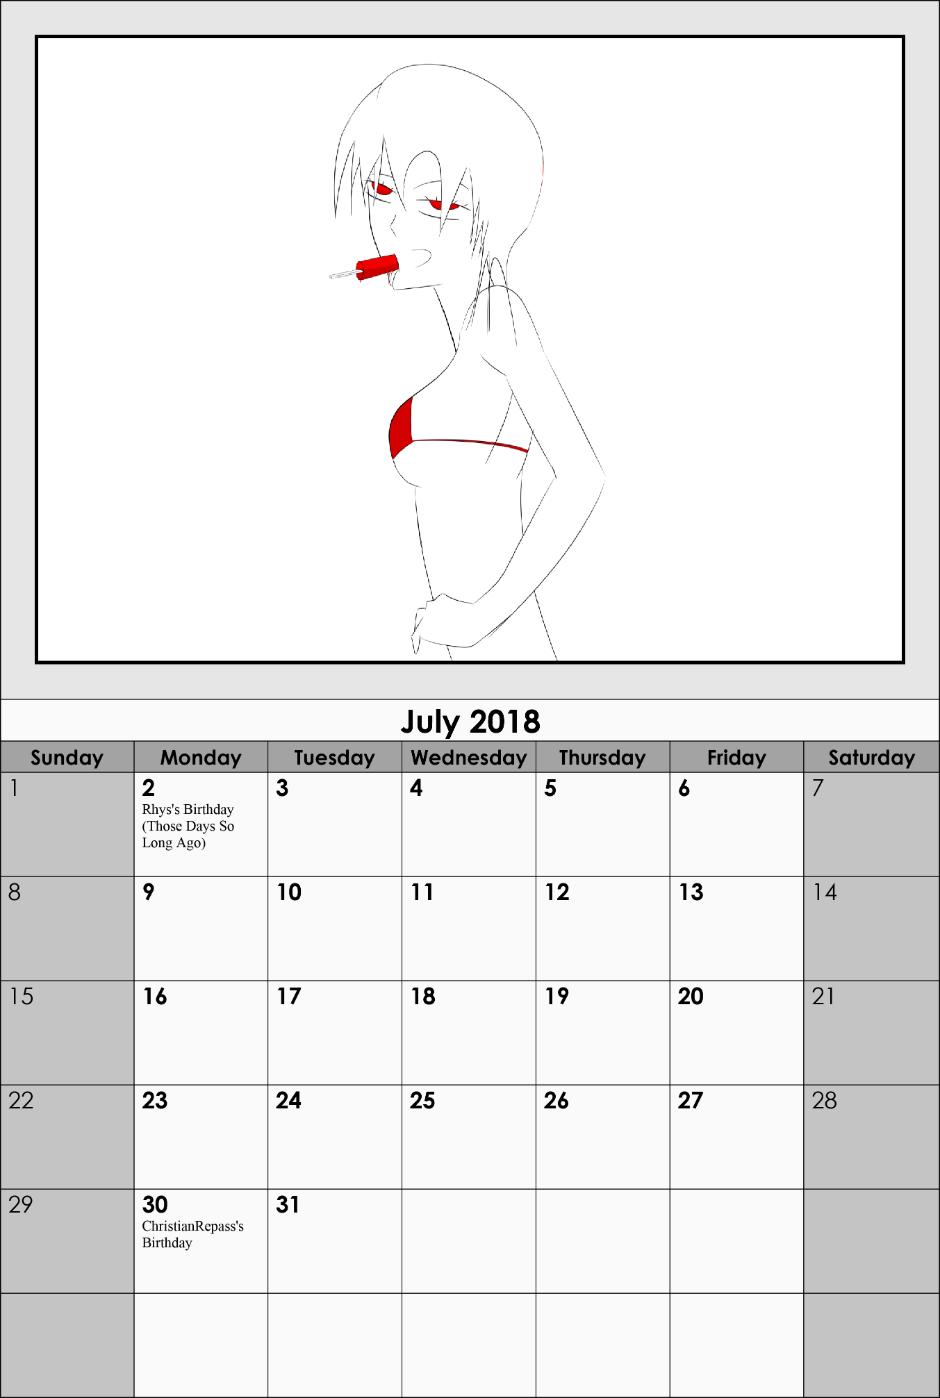 Rulerbrain - July